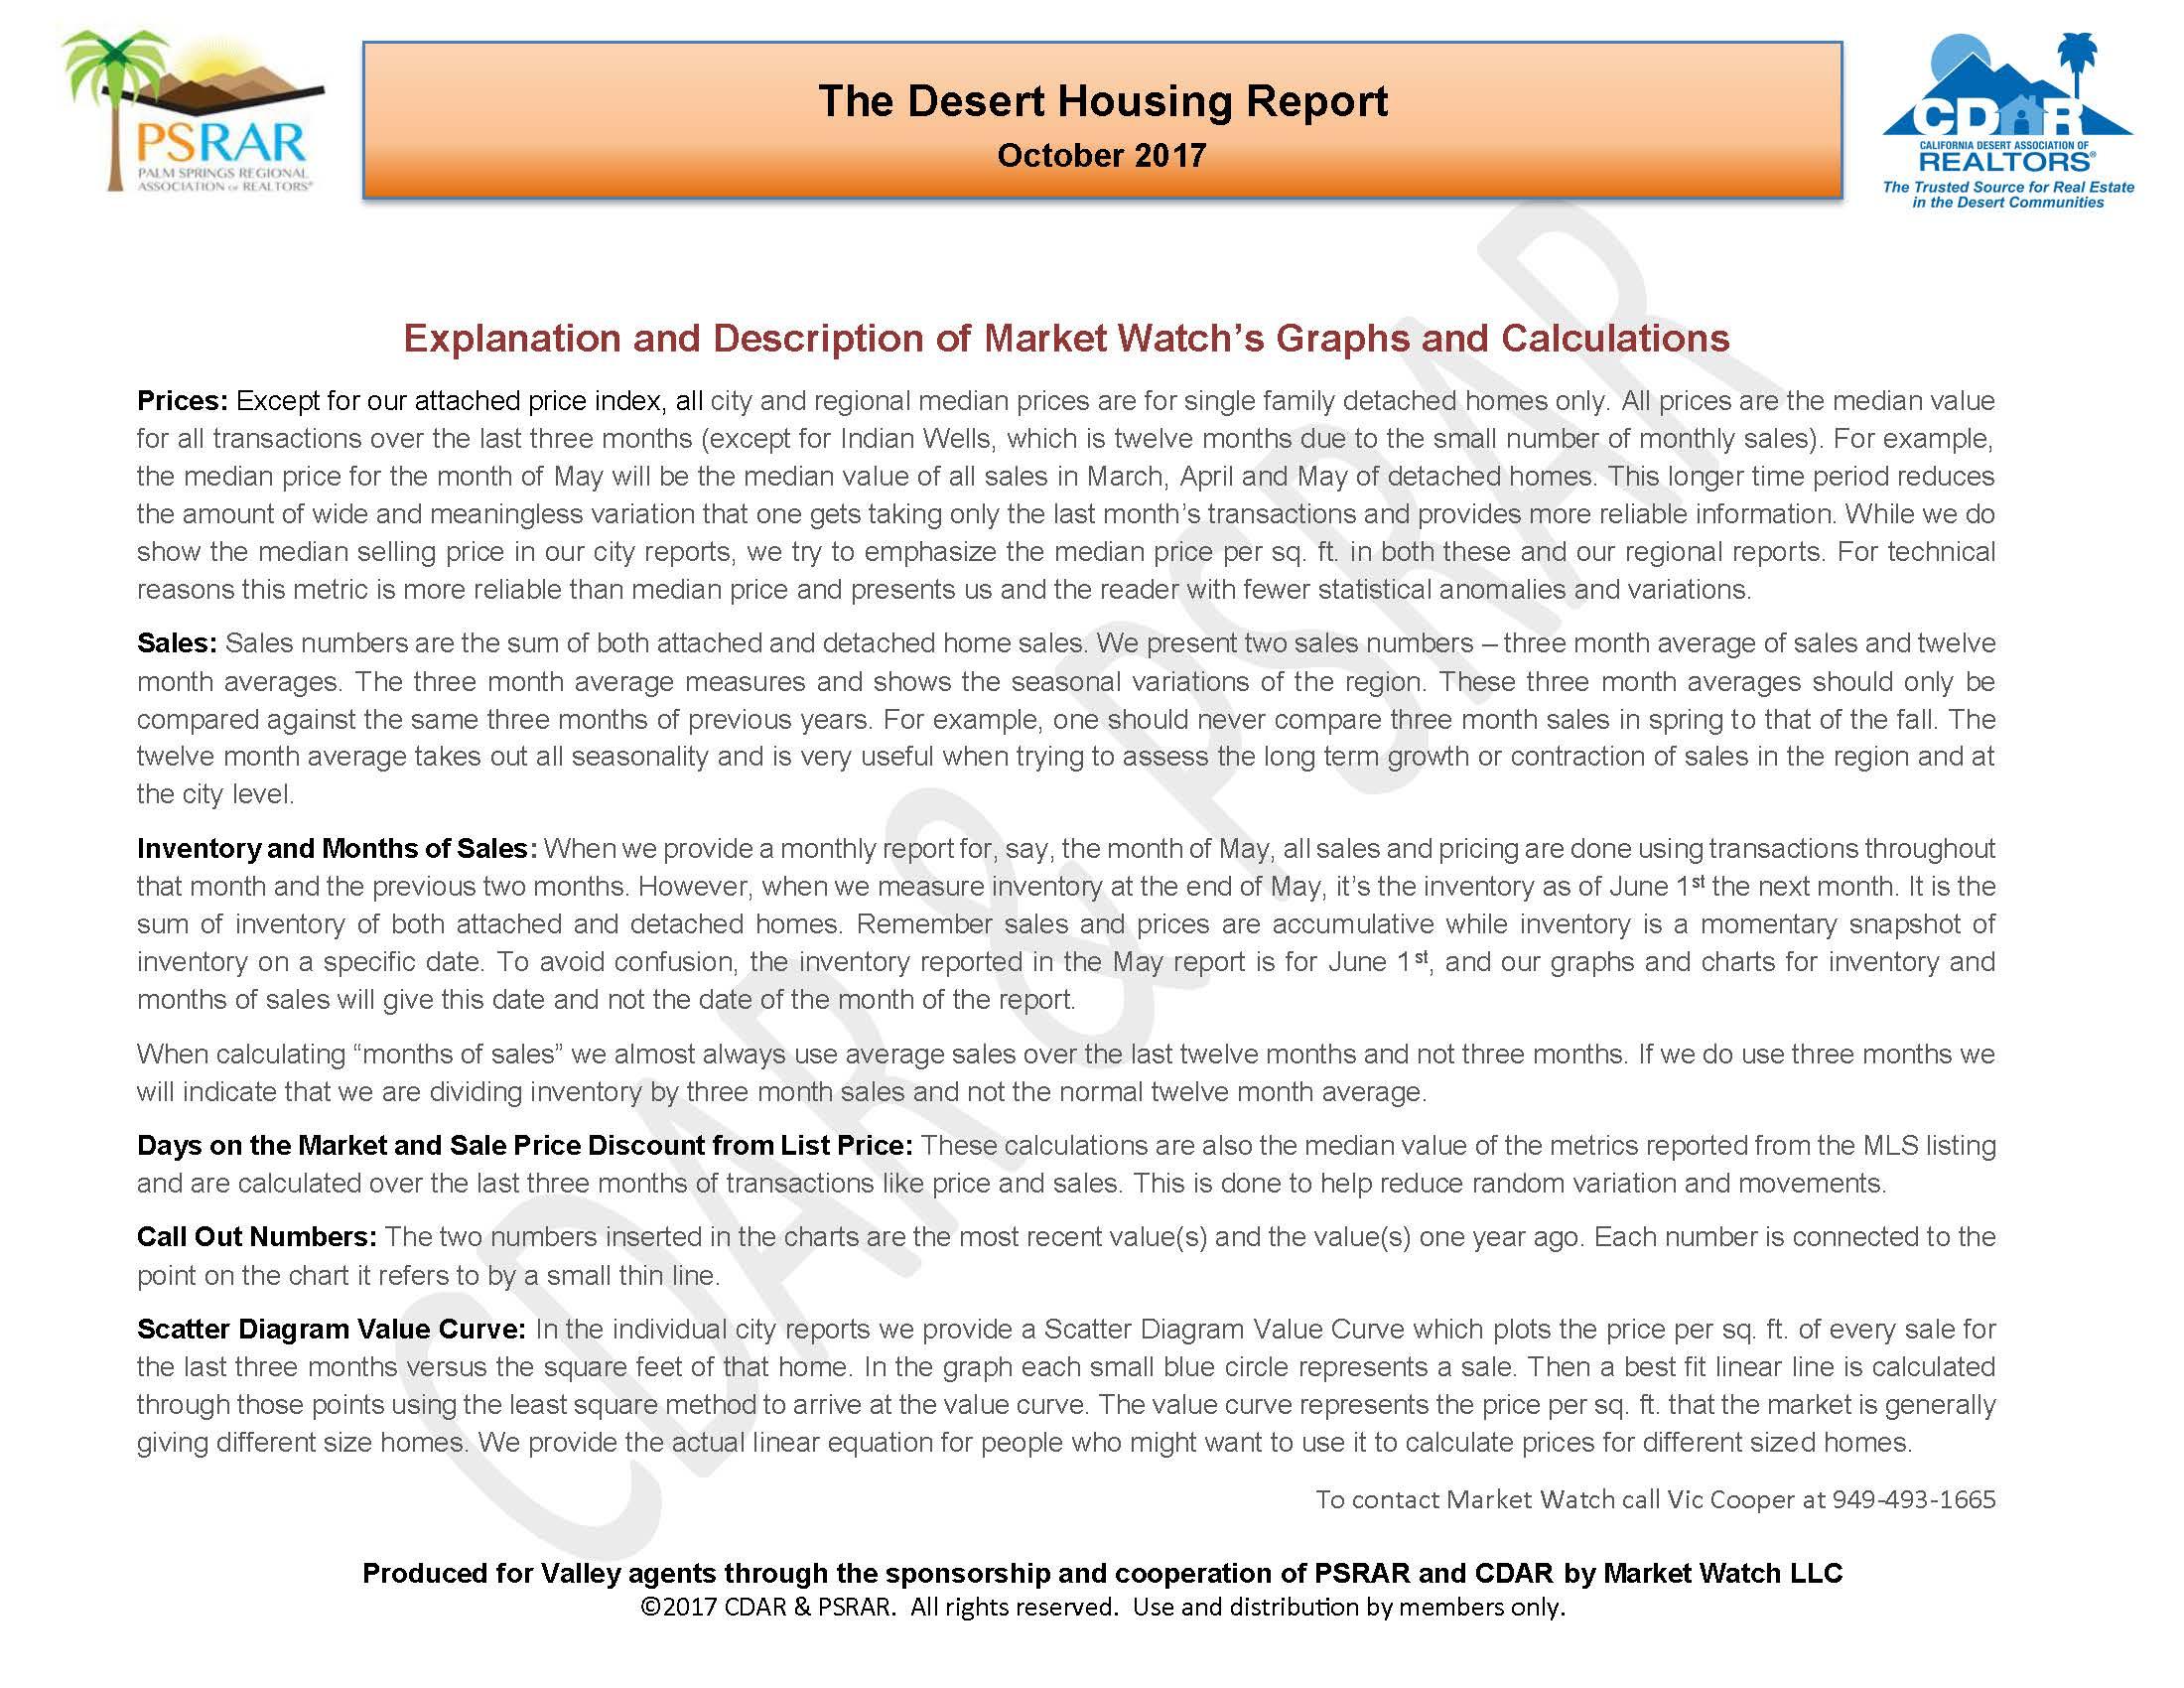 October 2017 Desert Housing Report_Page_14.jpg